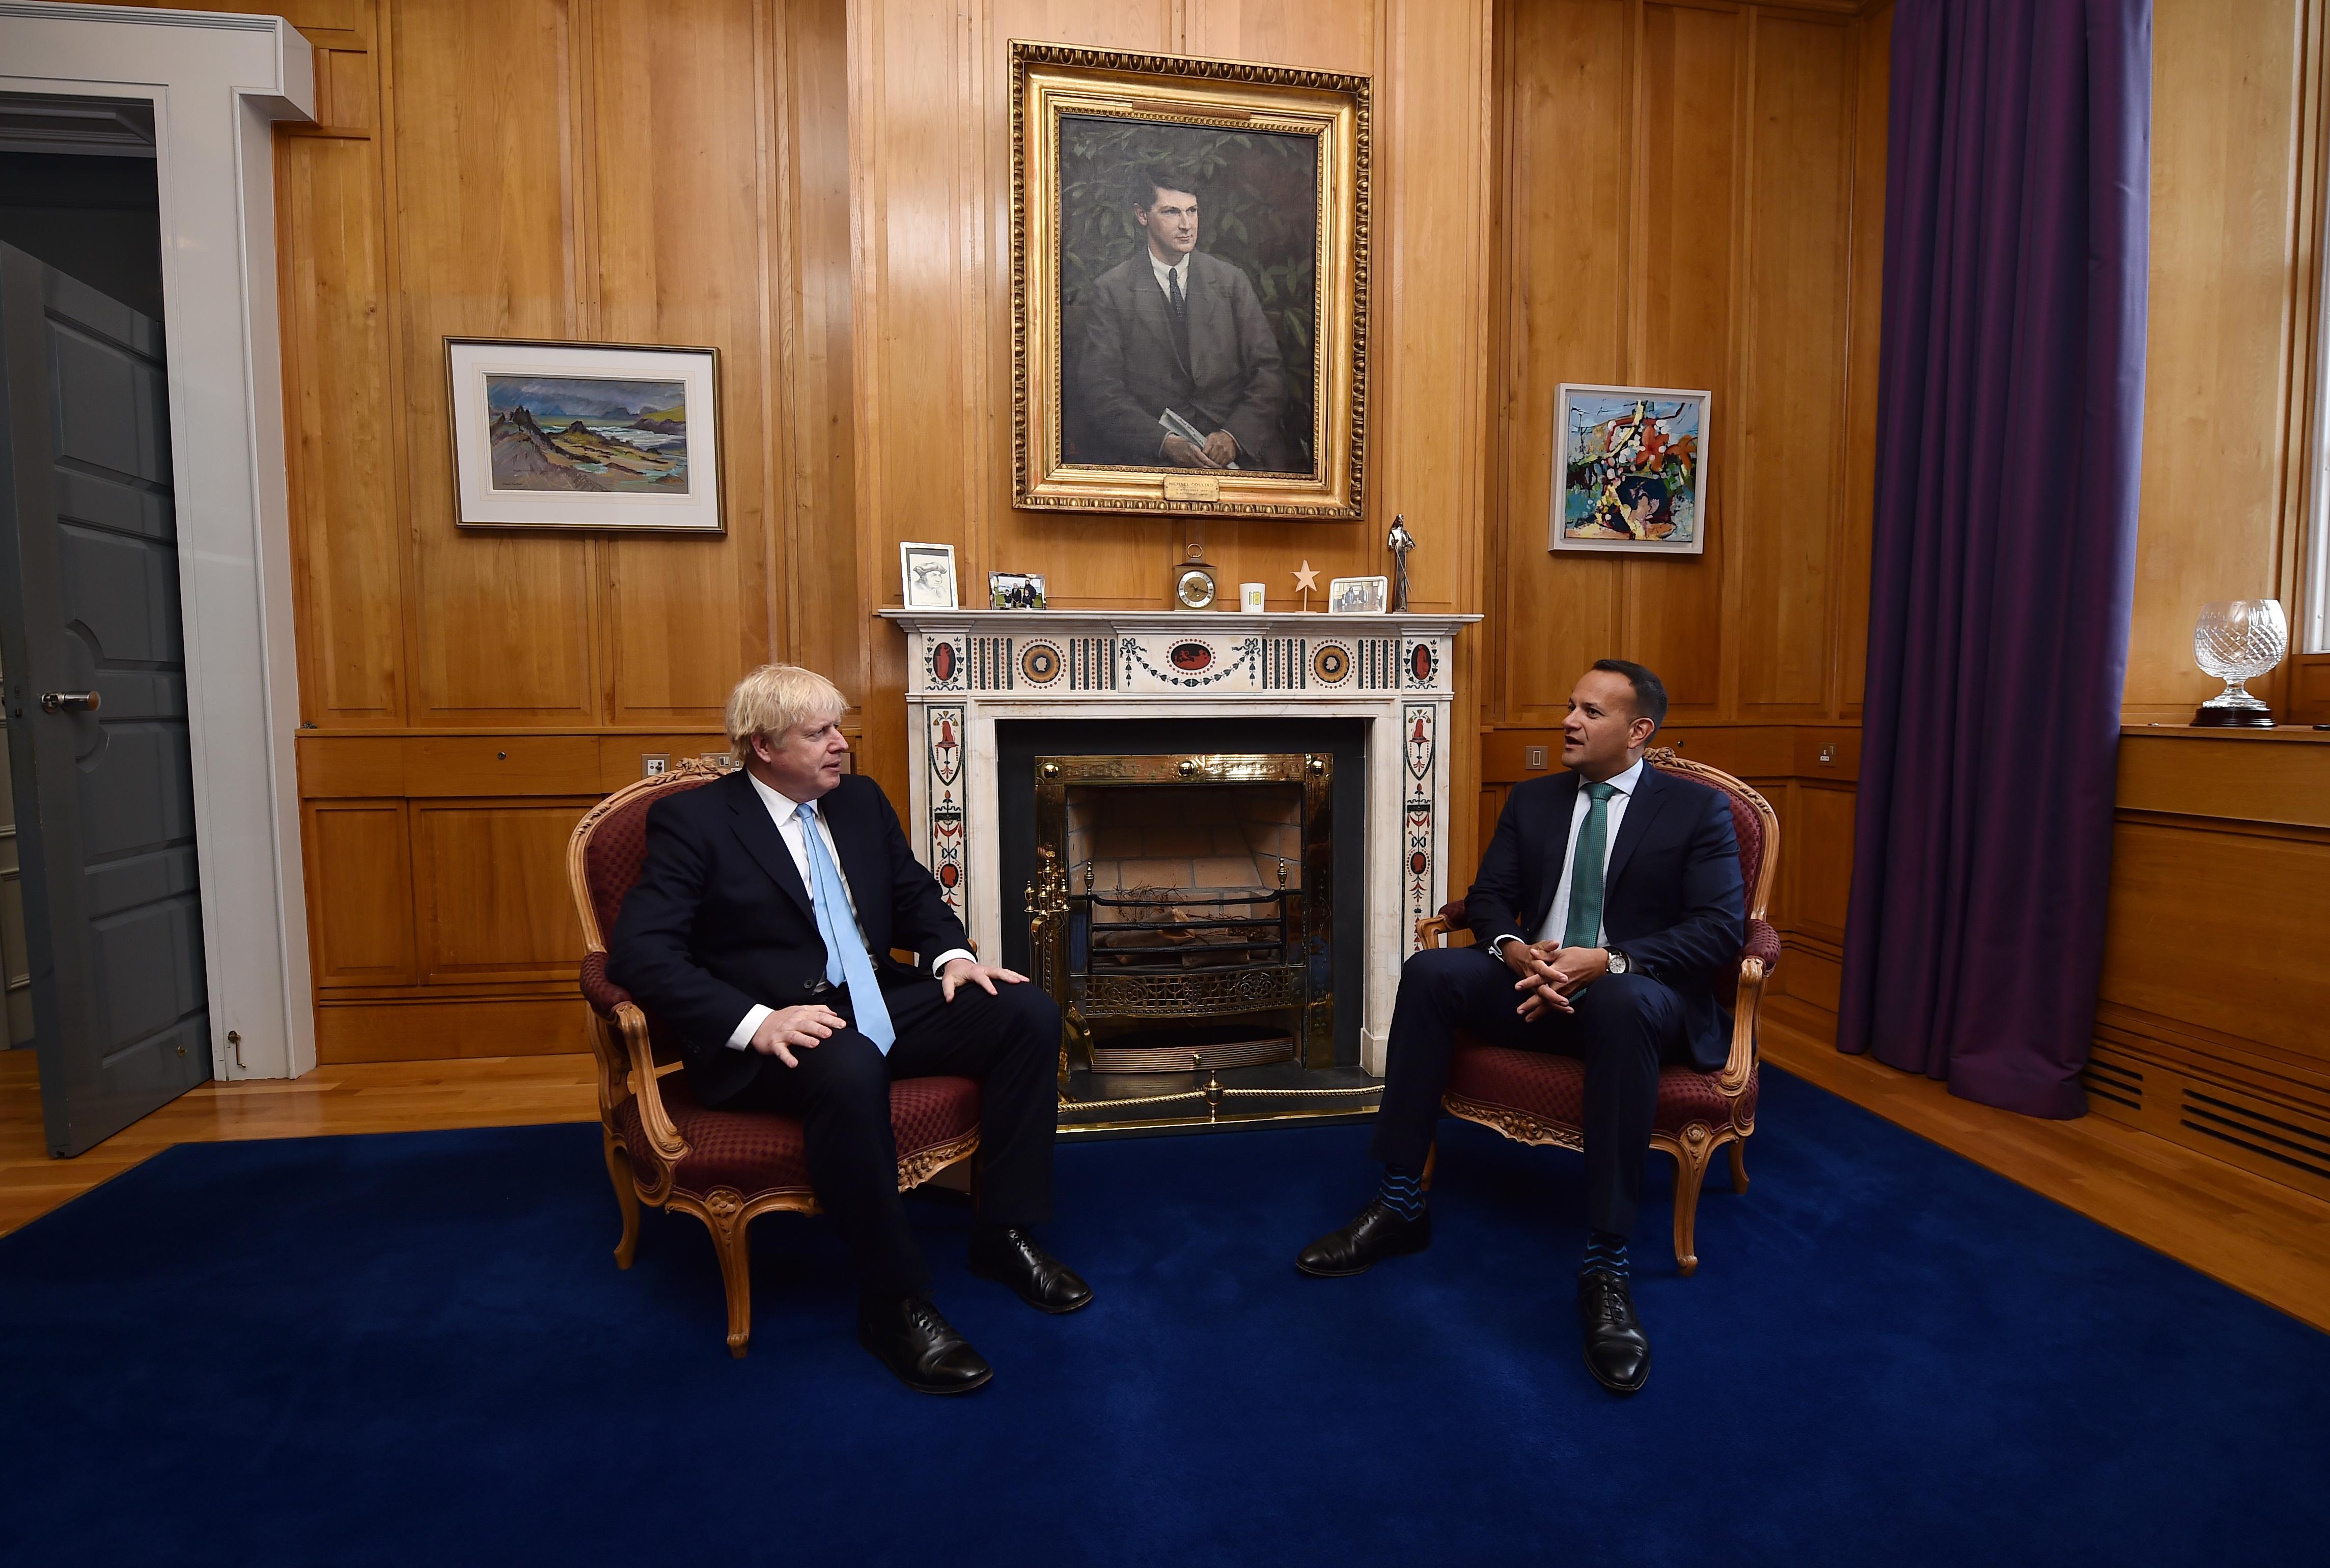 British Prime Minister Boris Johnson meets with Irish Taoiseach Leo Varadkar at Government Buildings.